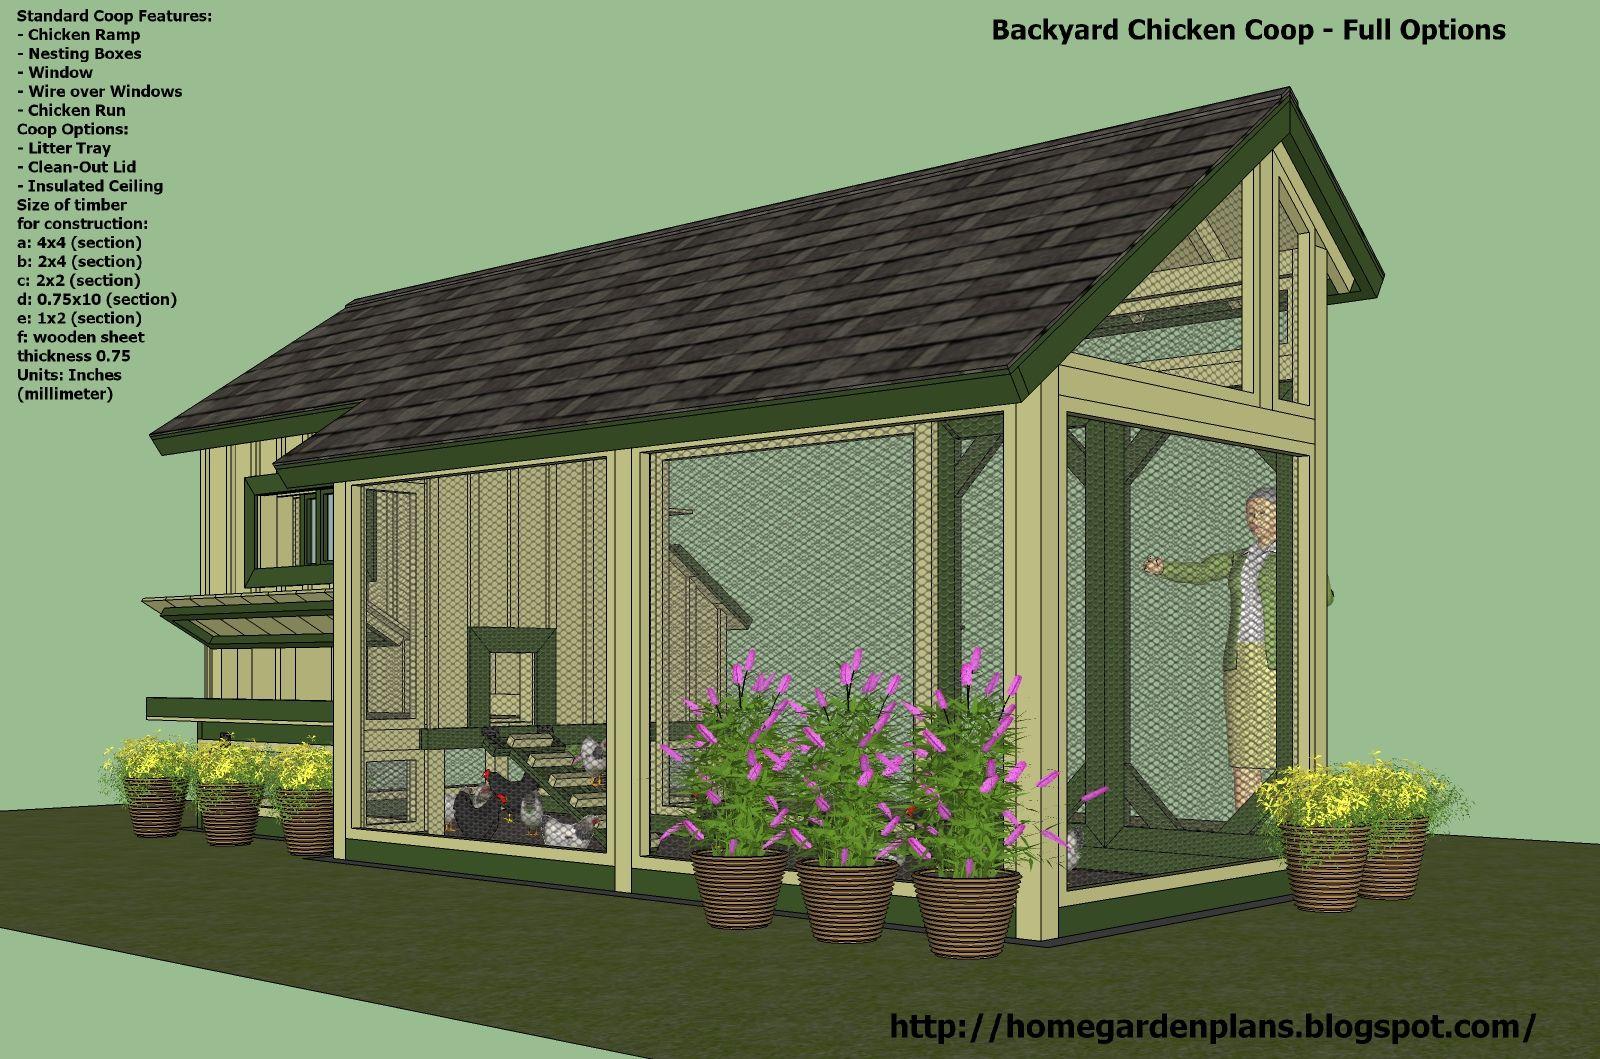 Home Garden Plans: M200   Perfect Options   Backyard Chicken Coop Plans   Free  Chicken